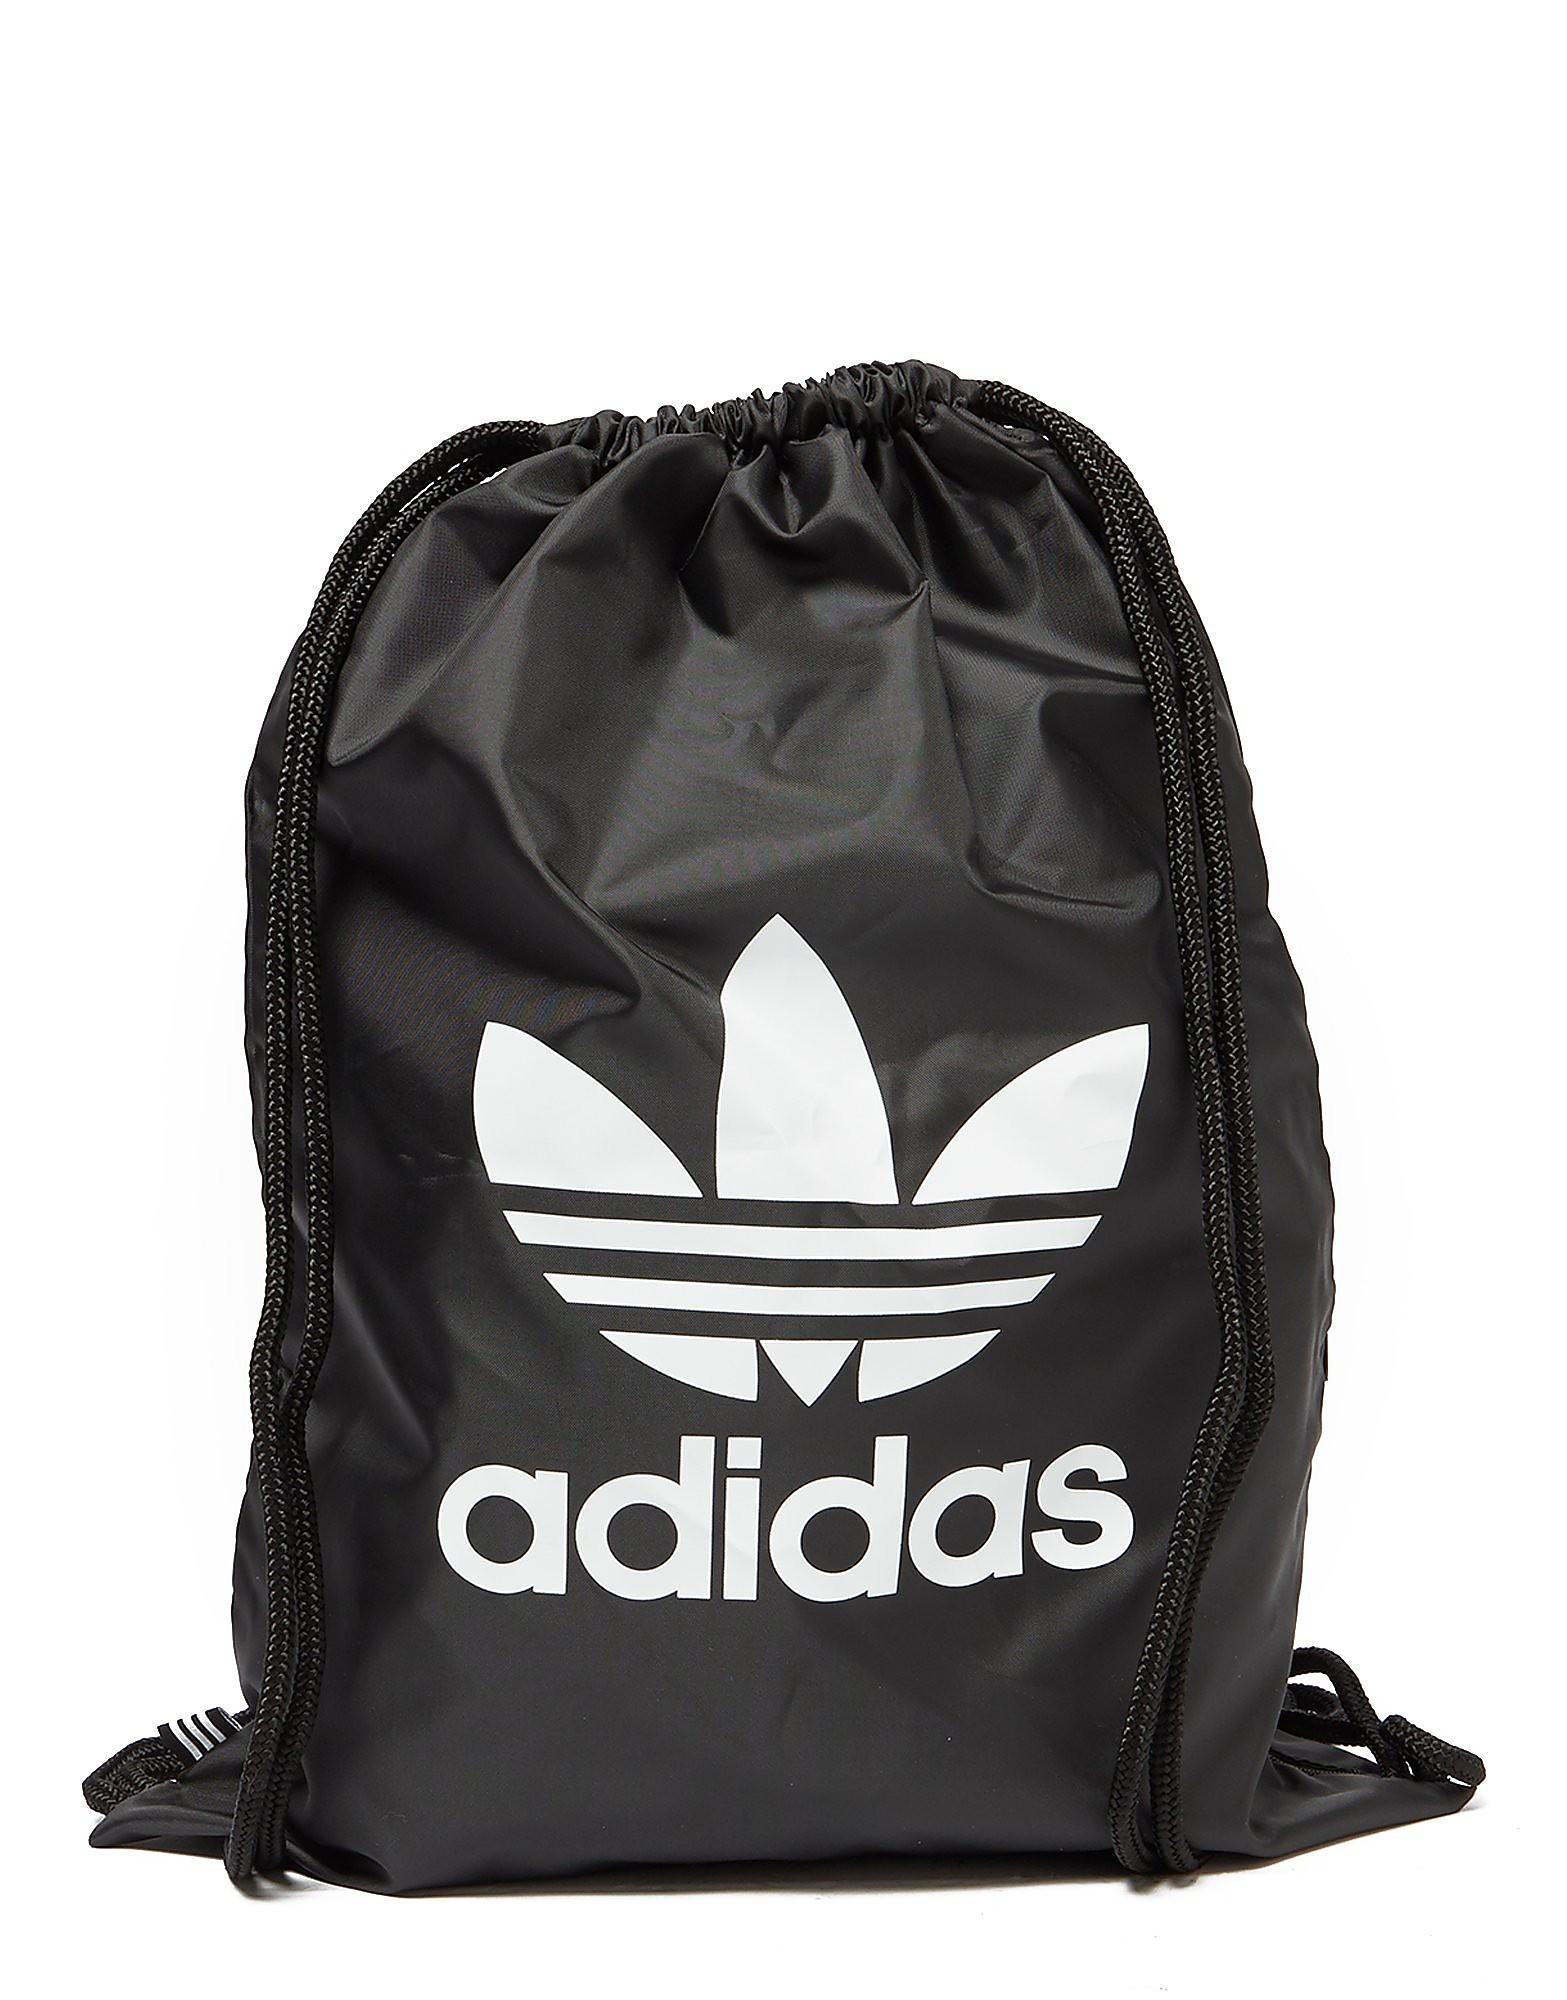 adidas Originals Tricot Sportbeutel